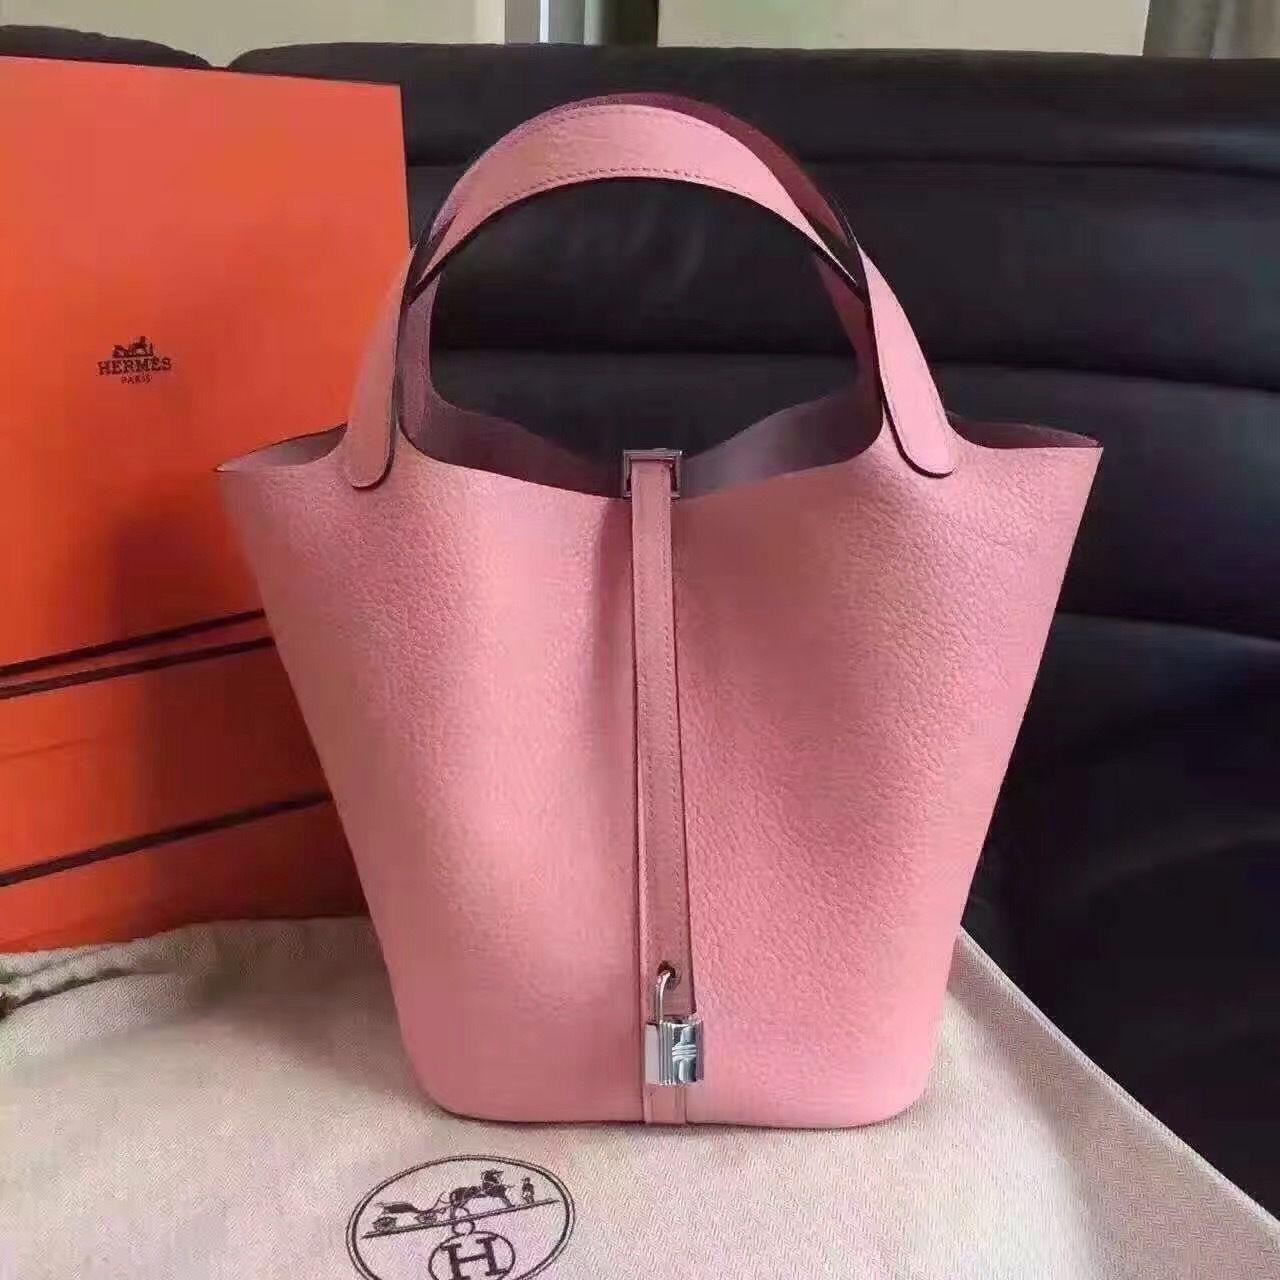 034be06feb8f Hermes Sakura Pink Picotin Lock 18 Togo Leather Bag #hermes #hermespicotin  #hermesbag